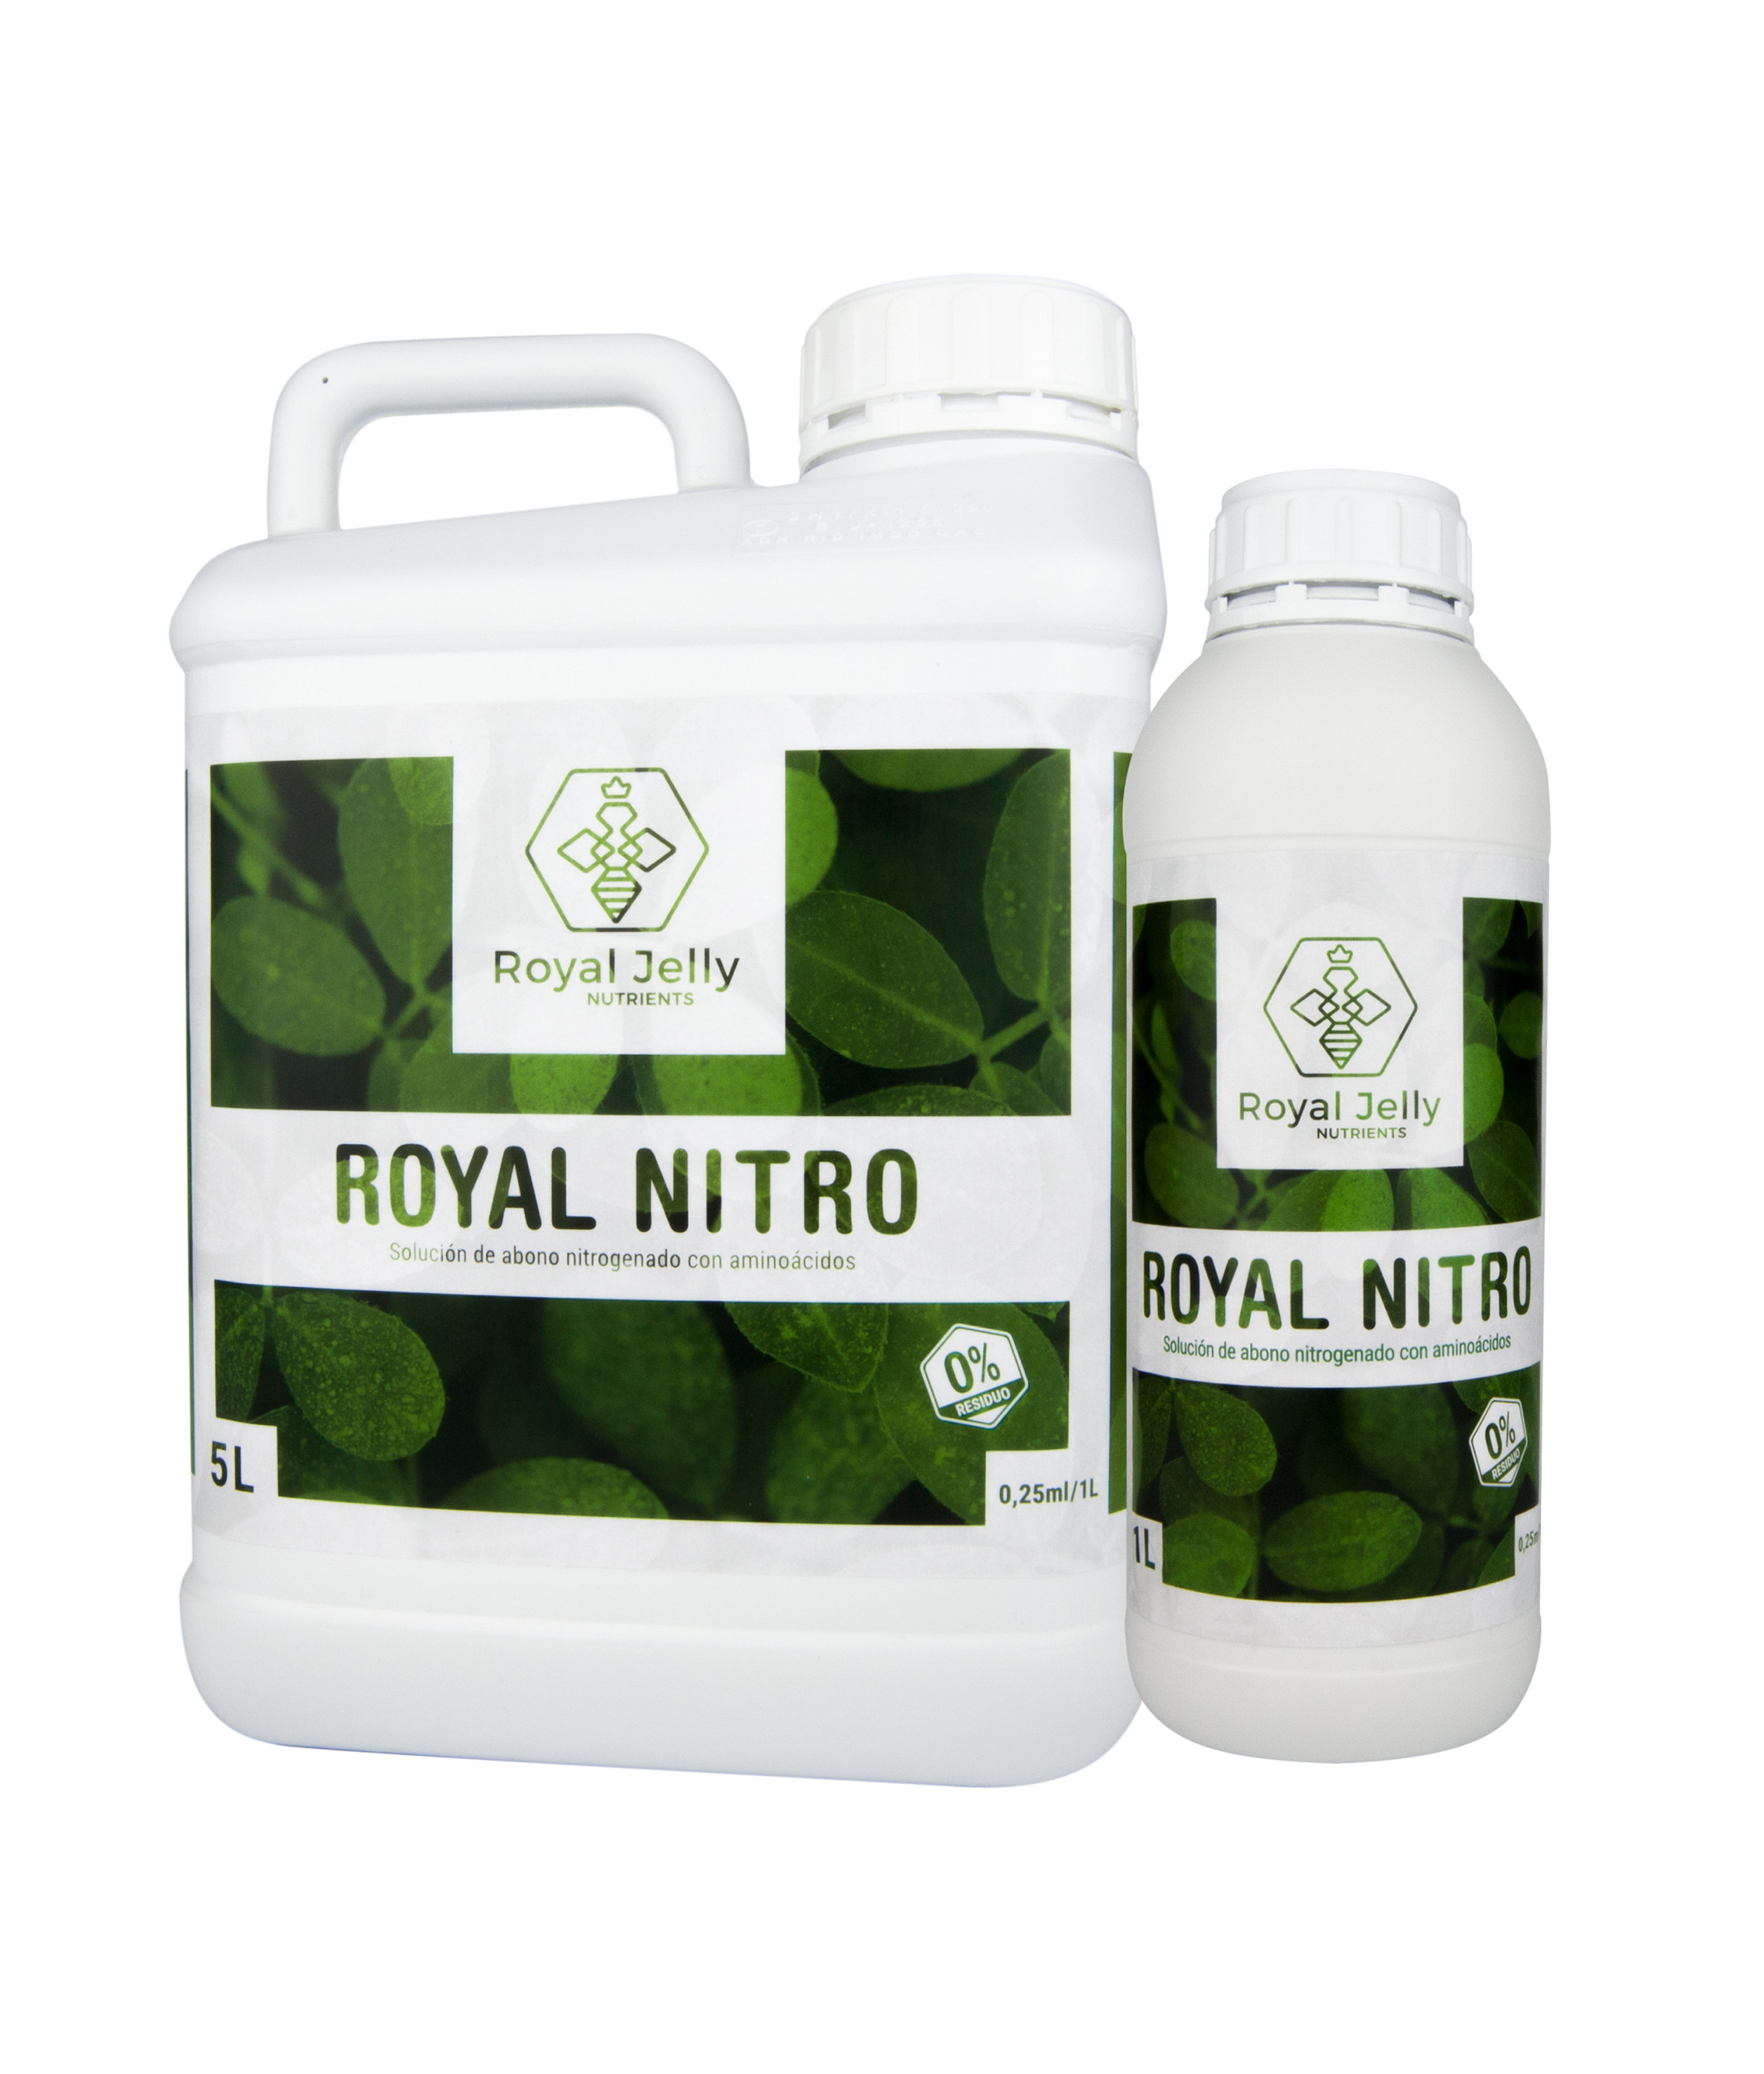 royal nitro bodegó proba